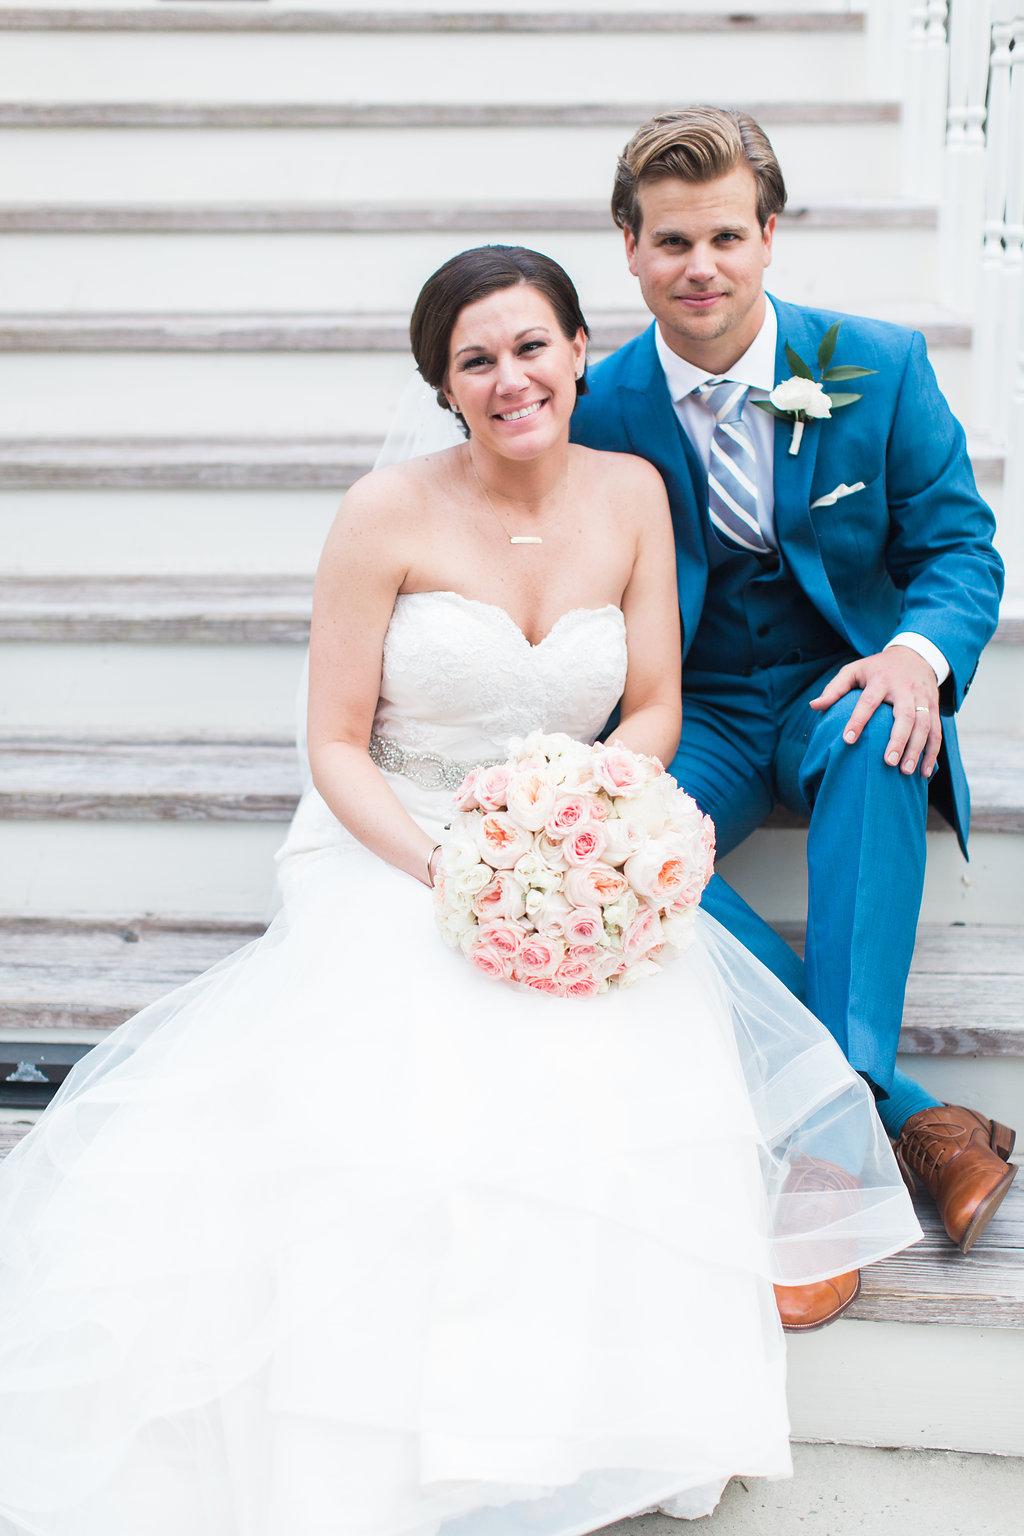 apt-b-photography-ivory-and-beau-bridal-boutique-savannah-florist-savannah-wedding-flowers-savannah-wedding-planner-tybee-island-wedding-chapel-wedding-rose-bouquet-blush-wedding-tybee-wedding-savannah-weddings-savannah-flowers-37.jpg